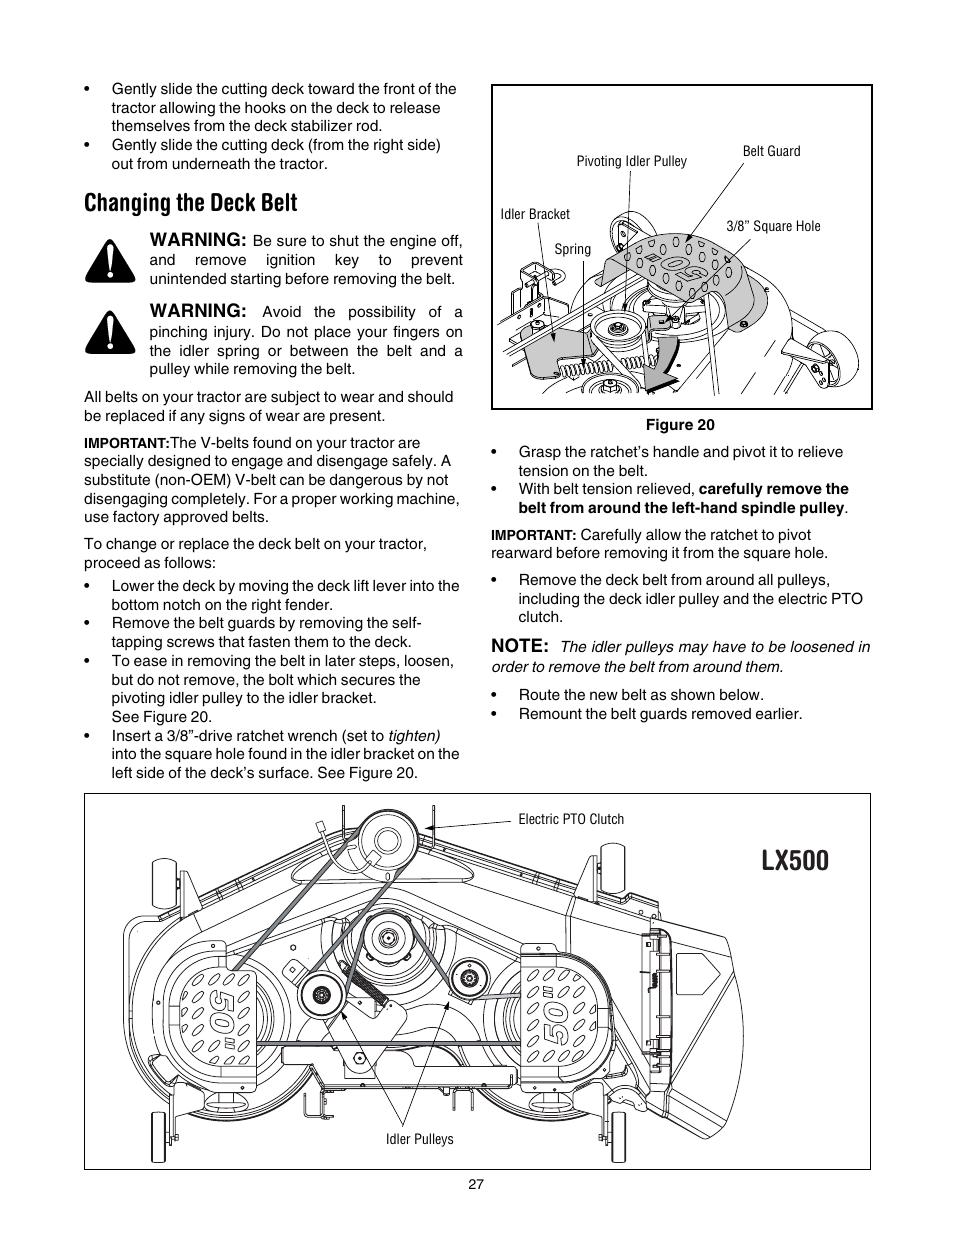 Toro Lx500 Lawn Mower Wiring Diagram Trusted Zero Turn Owners Manual Online User U2022